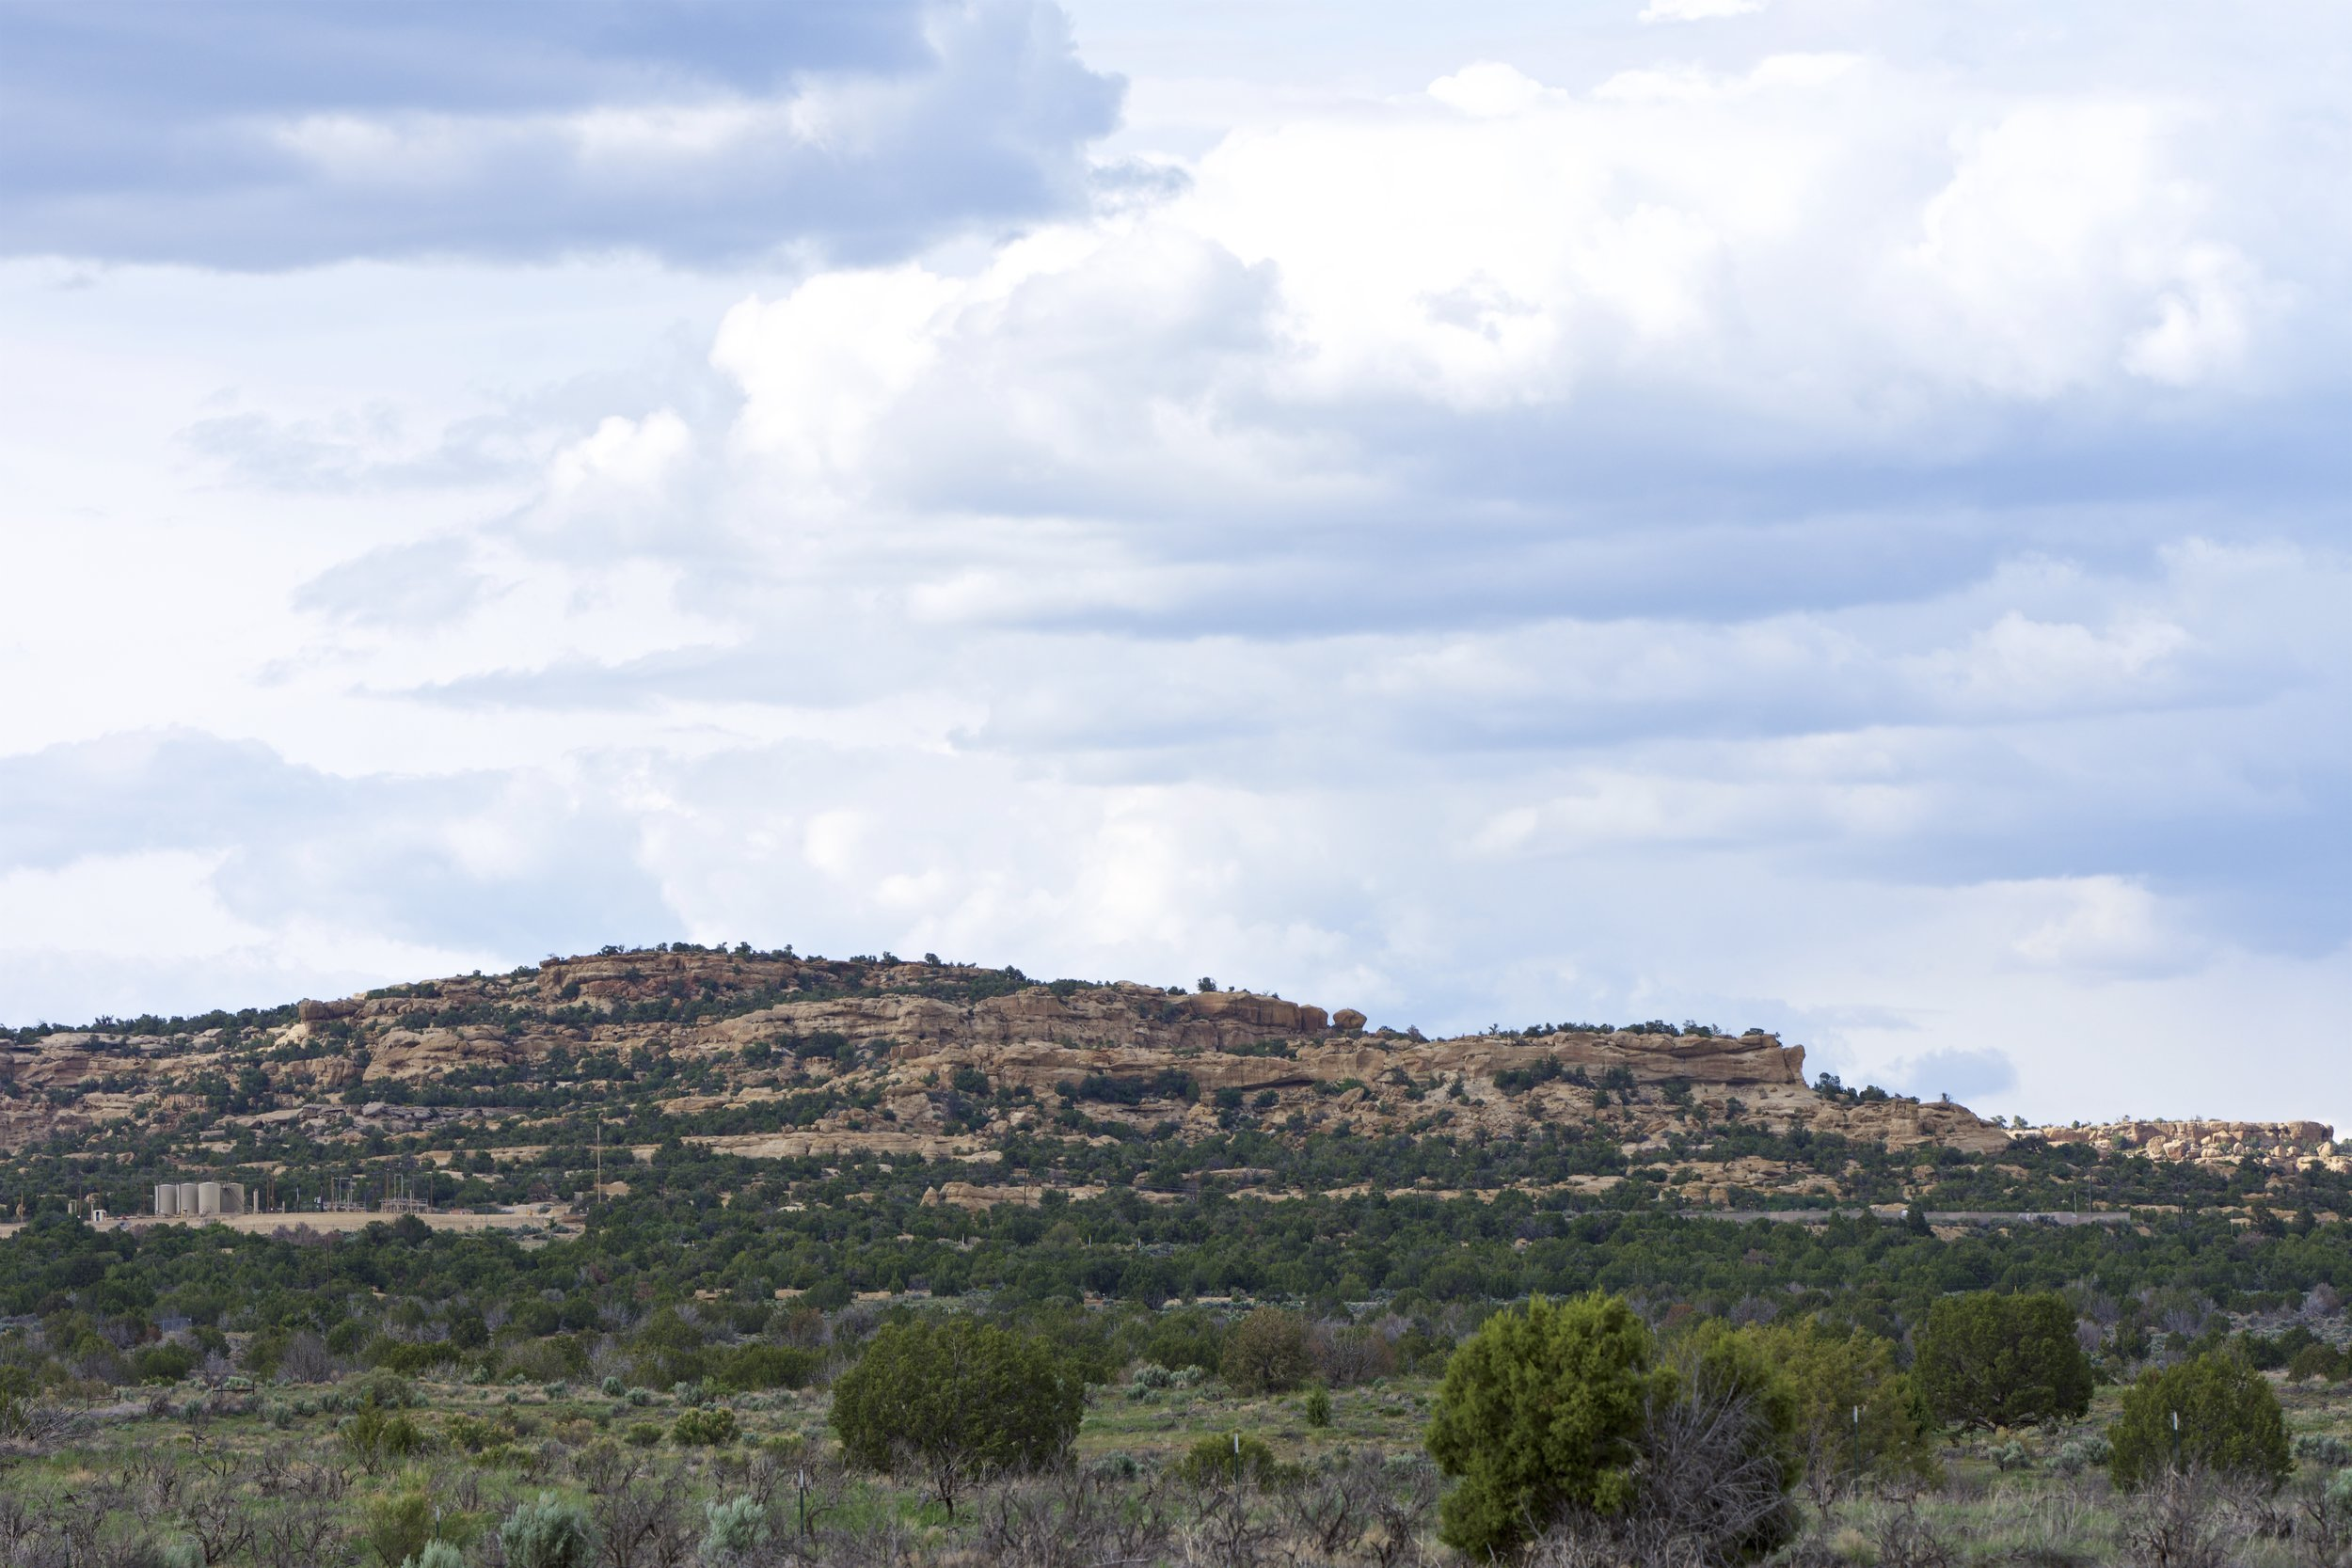 SJNM-4393-navajo-dam-128064.jpg